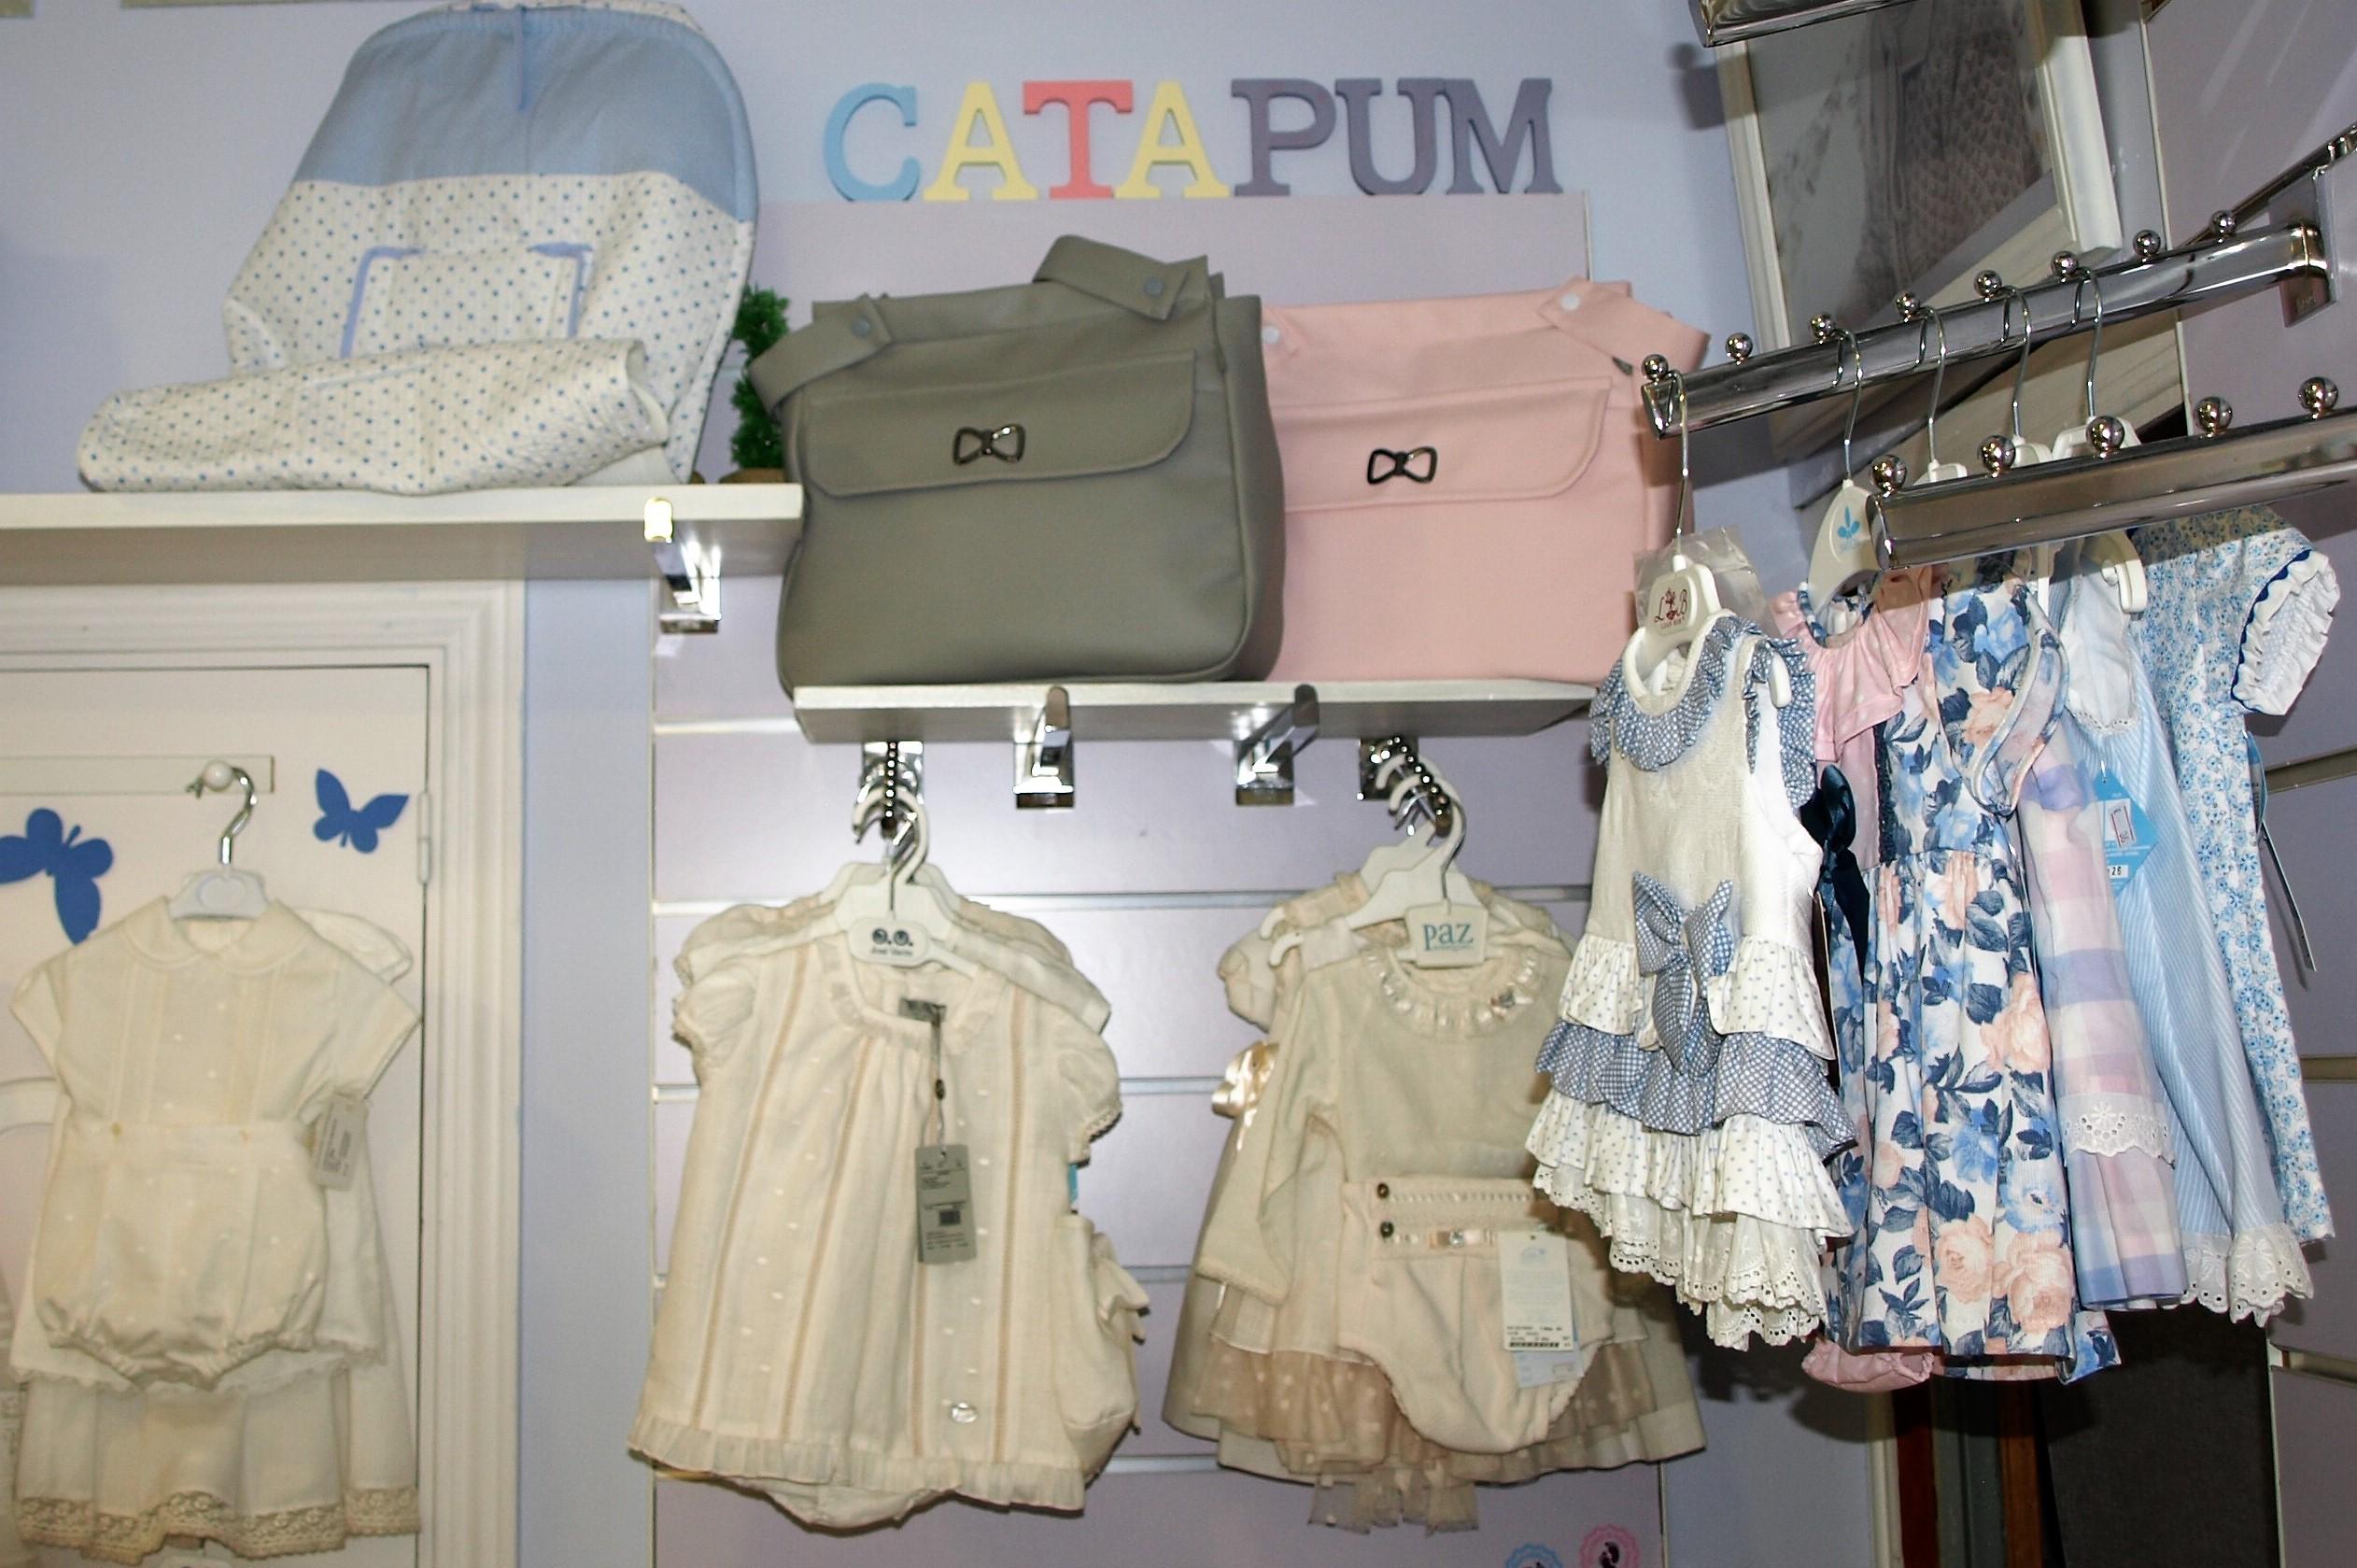 España Tienda ropa de bebes infantil Cáceres Catapum